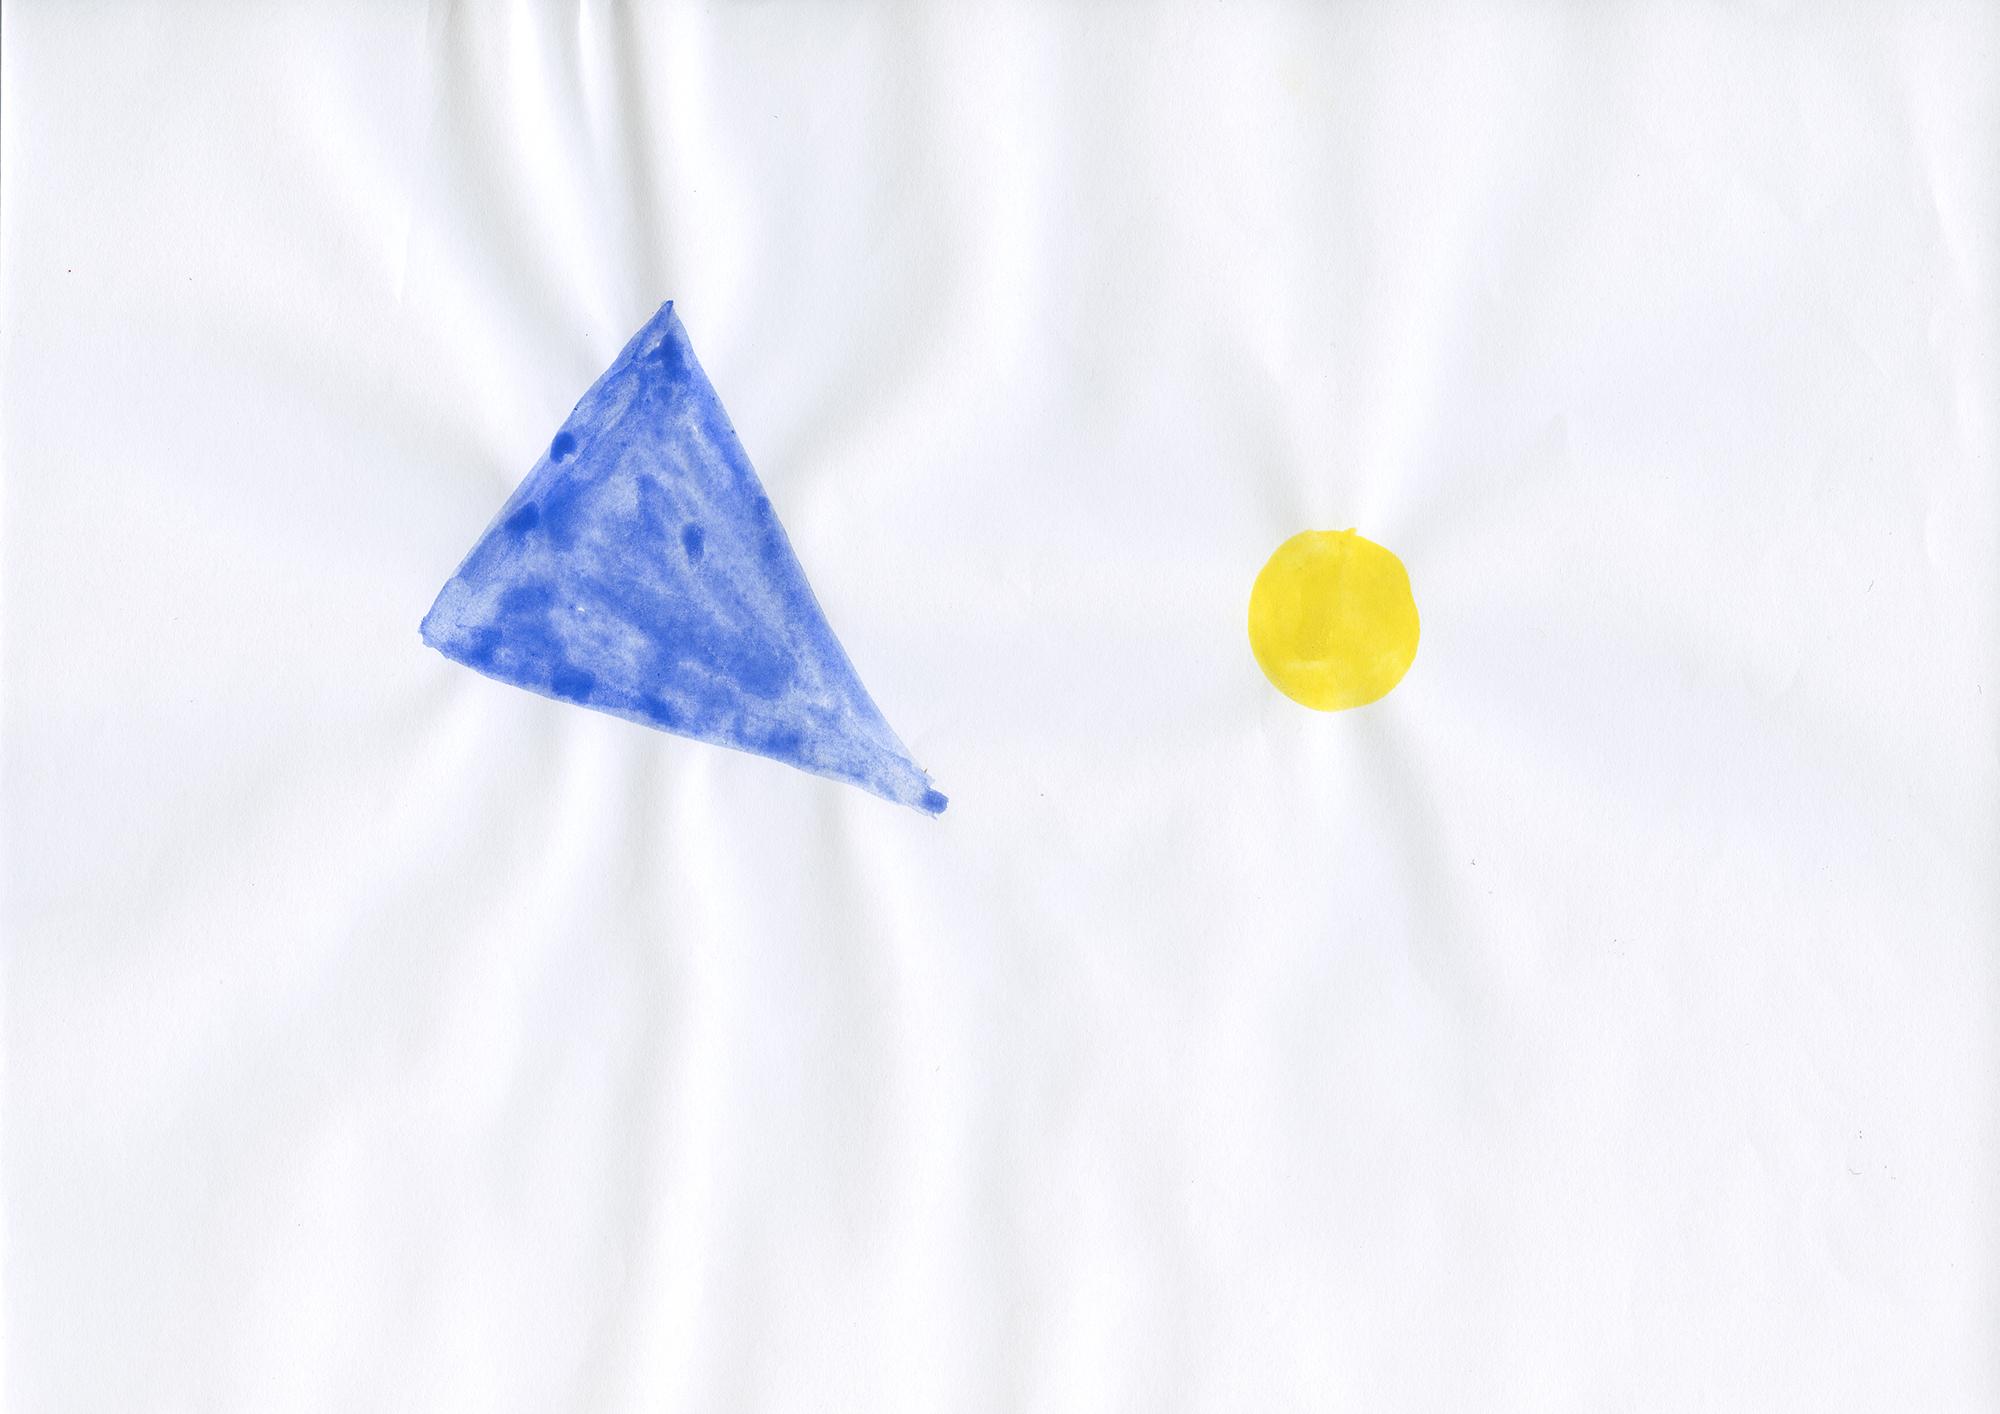 Untitled, 2006, gouache on paper, 21 x 29,7 cm